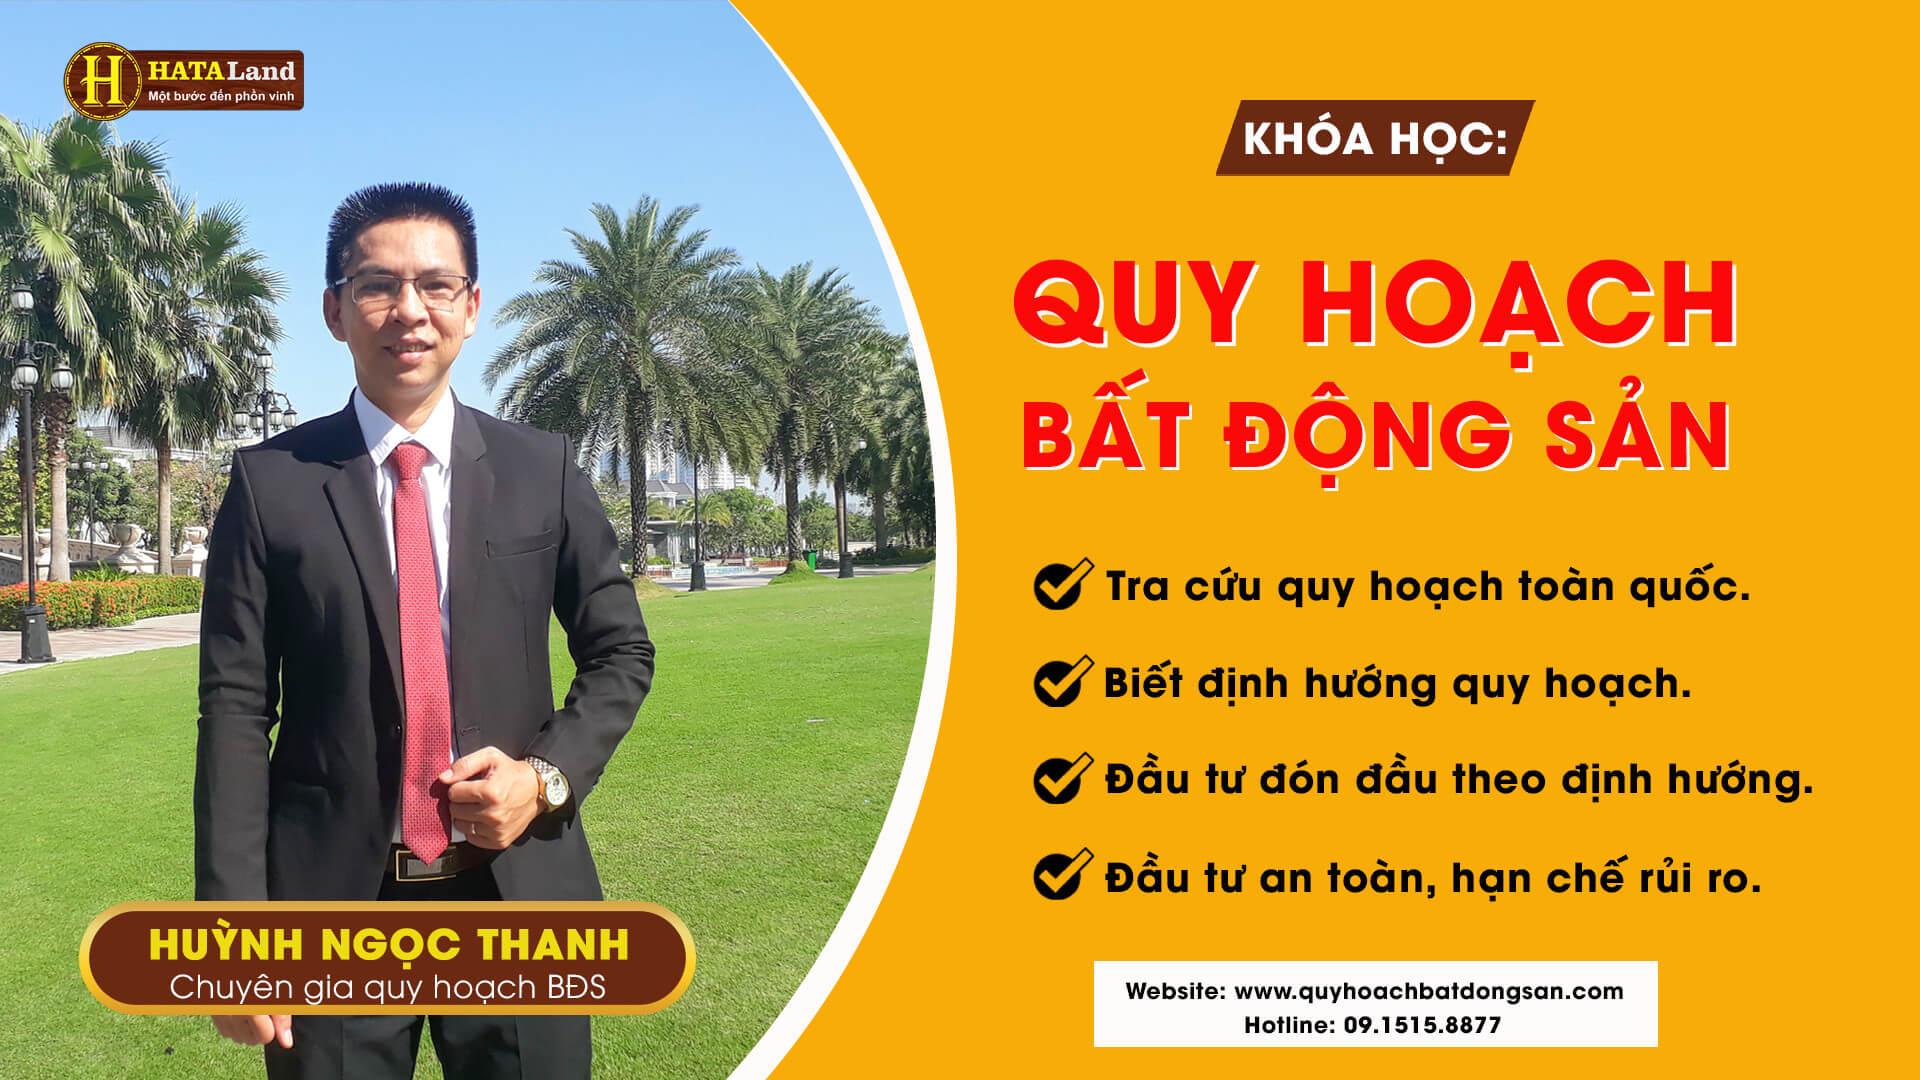 khoa-hoc-tra-cuu-thong-tin-Quy-hoach-bat-dong-san-toan-quoc